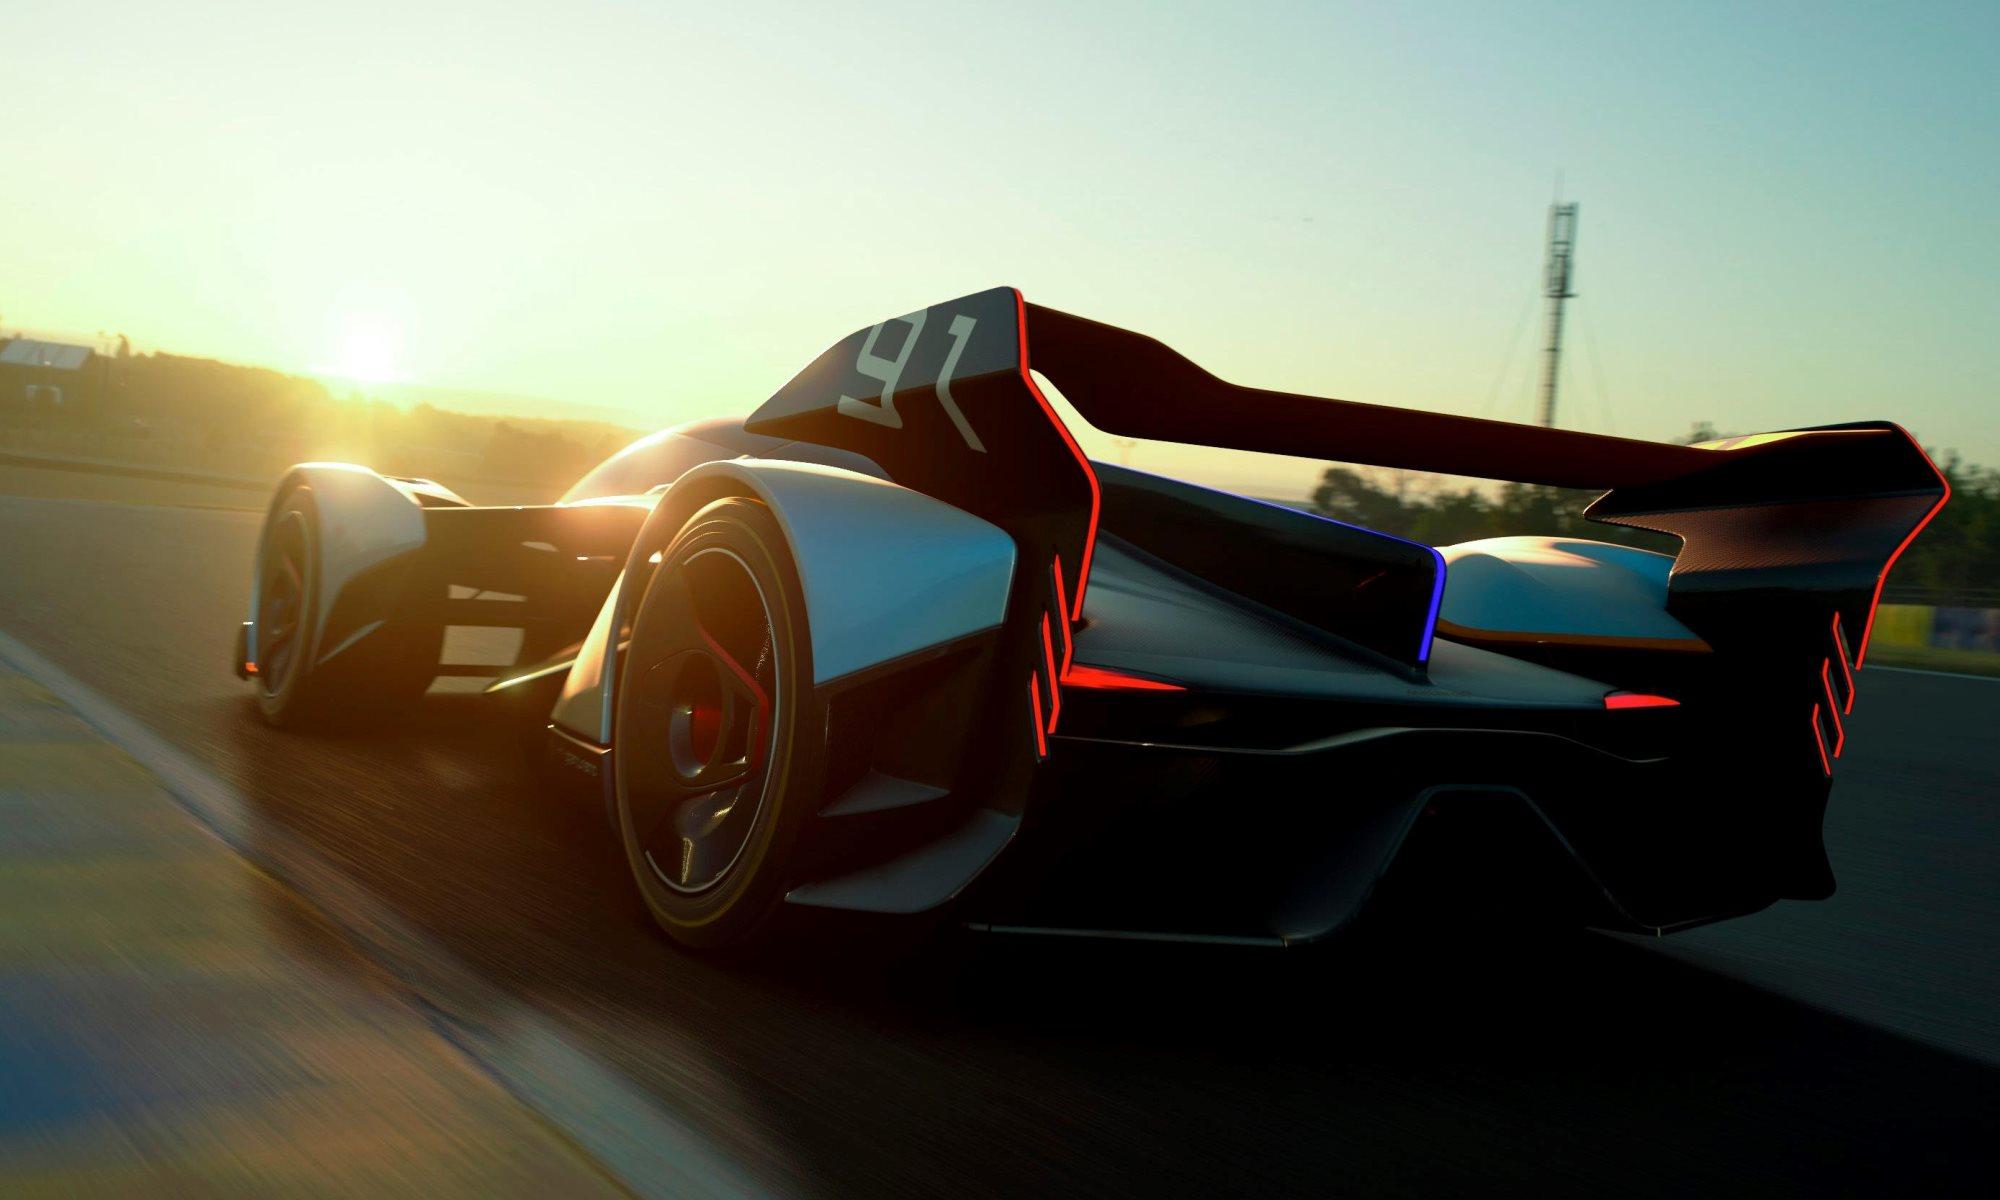 McLaren Vision GT concept rear